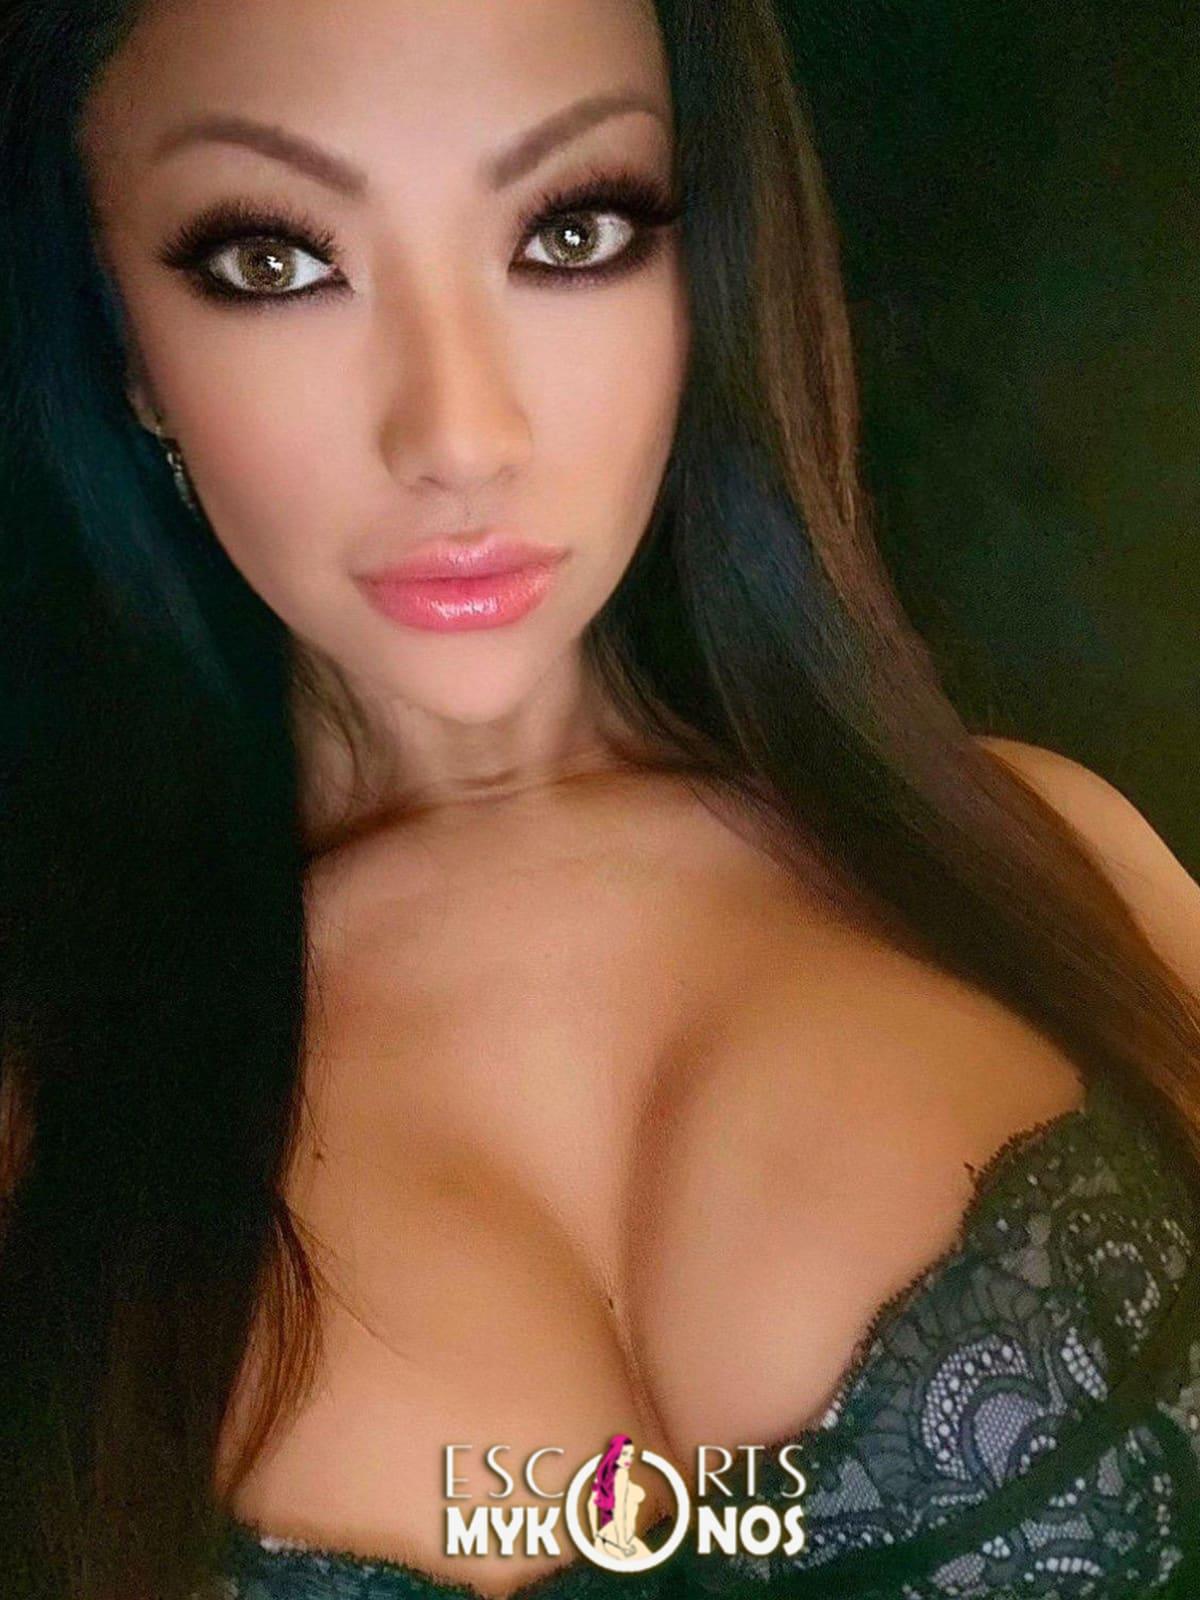 selfie angelina gray mykonos escorts playboy model